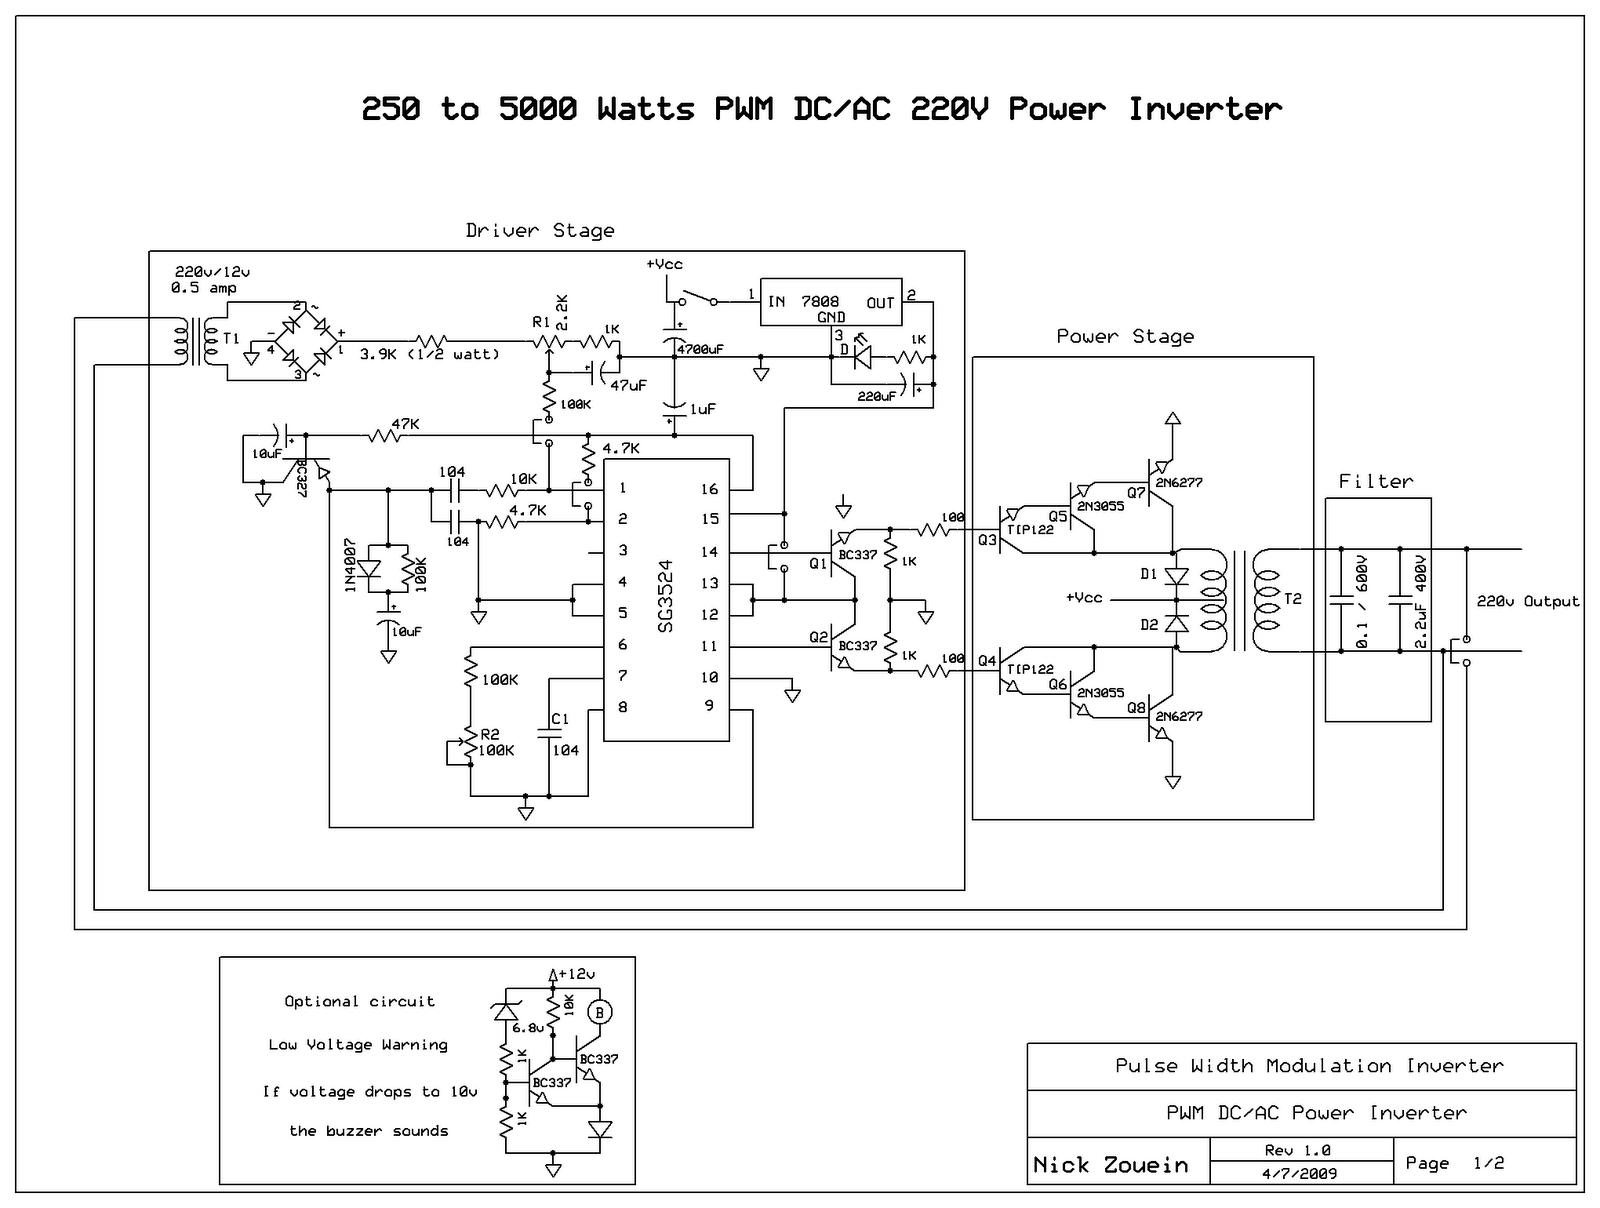 1000w Dell Power Supply Wiring Diagram Skema Rangkaian Inverter 5000 Watt Dengan Gambar